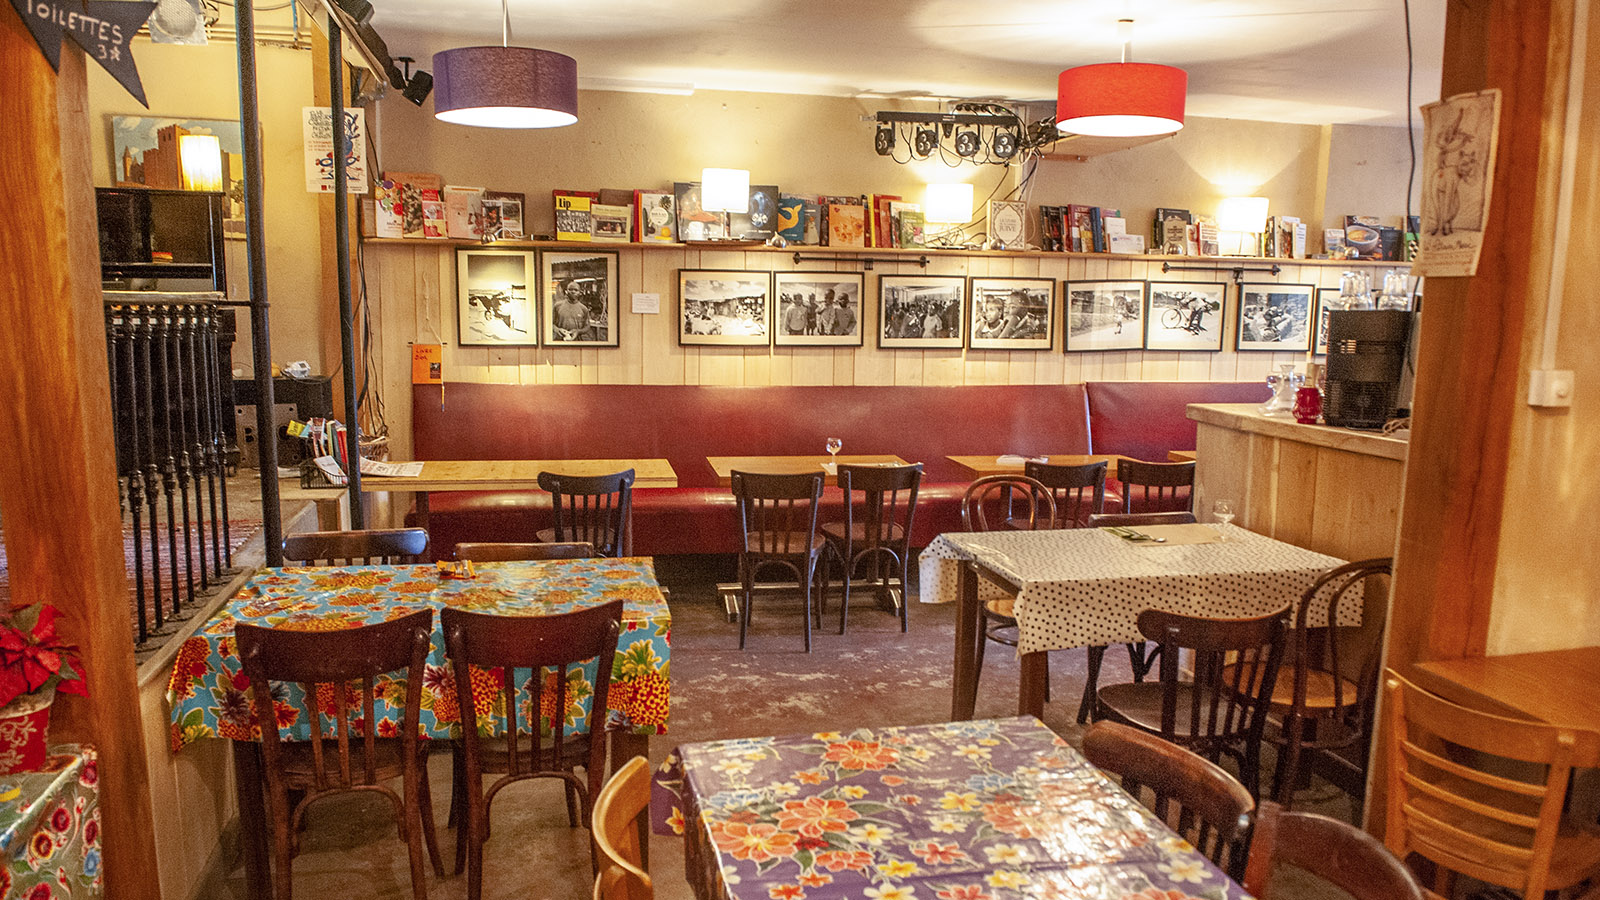 Simorre: der Speisesaal des BAO. Foto: Hilke Maunder